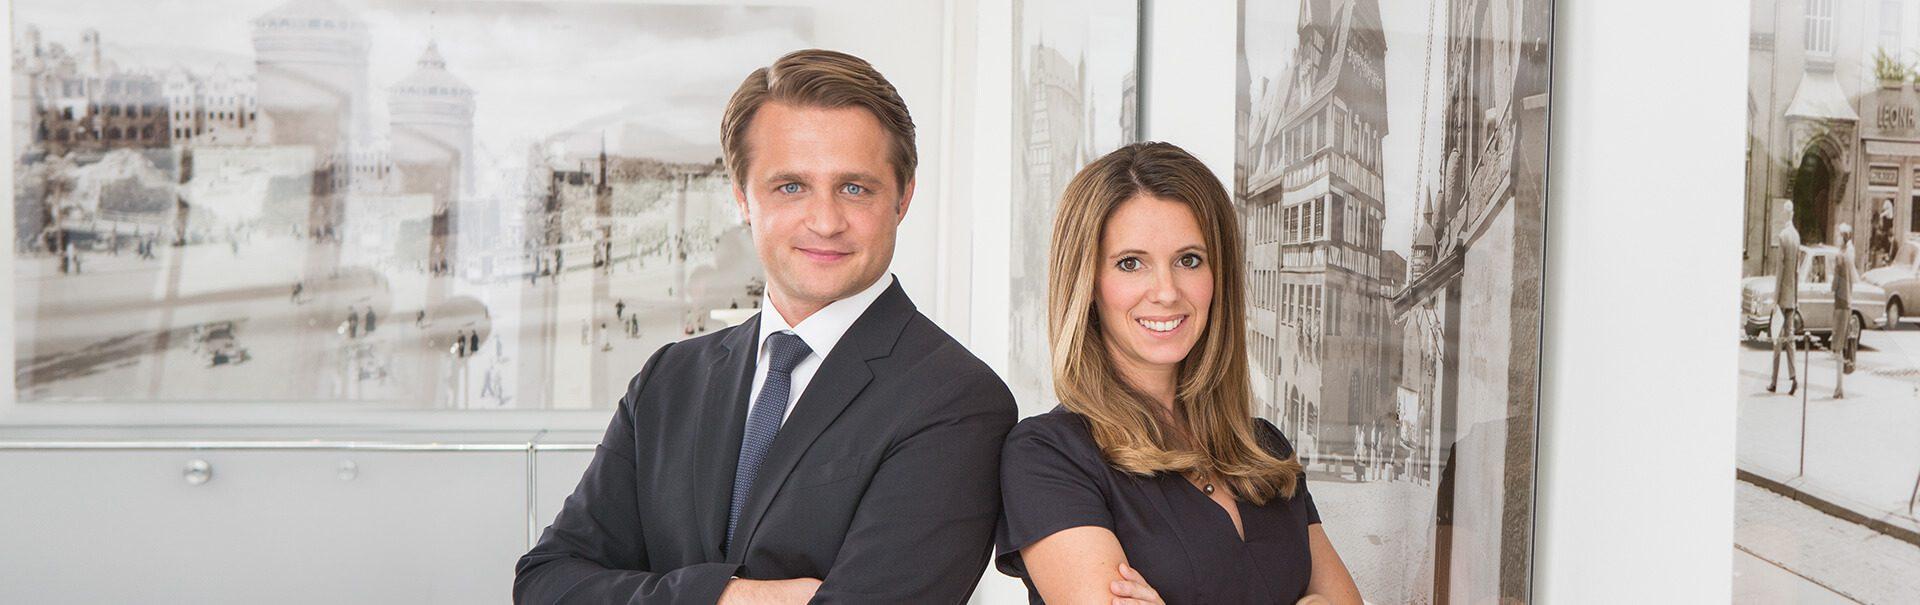 Immobilienmakler Stefan & Nicole Sagraloff